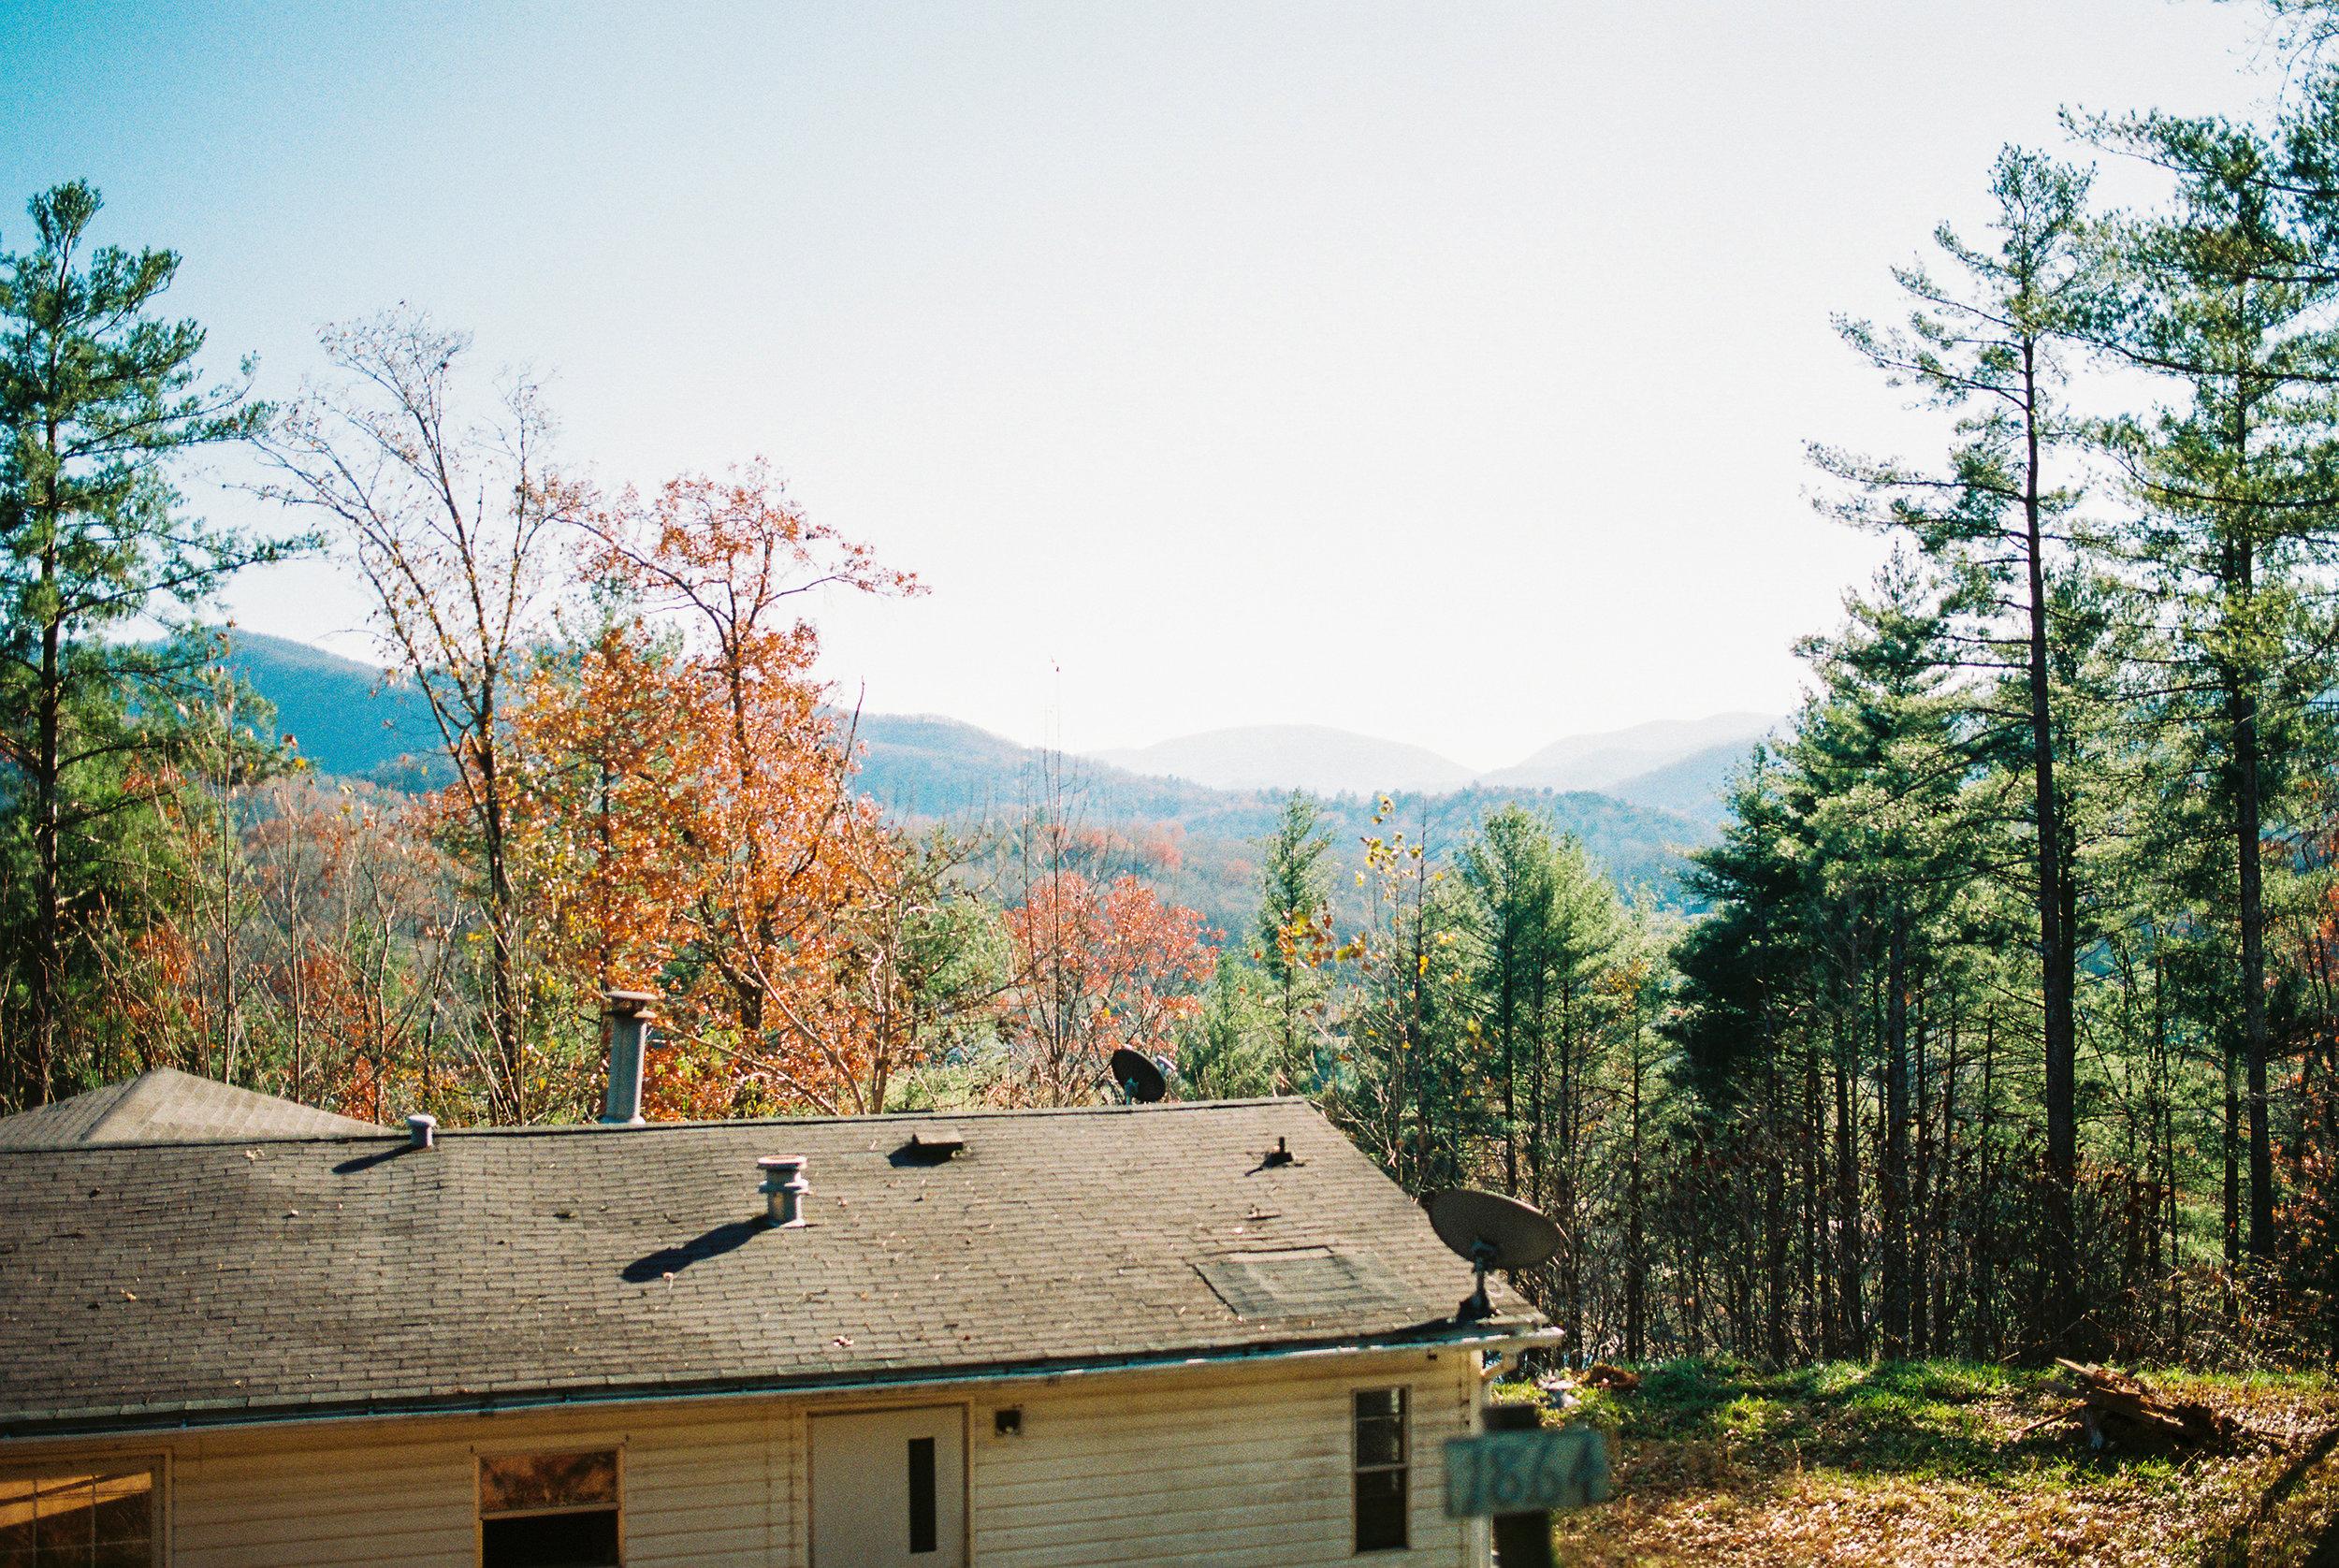 north-georgia-hiawasse-appalachian-mountains-photos-042-2.jpg